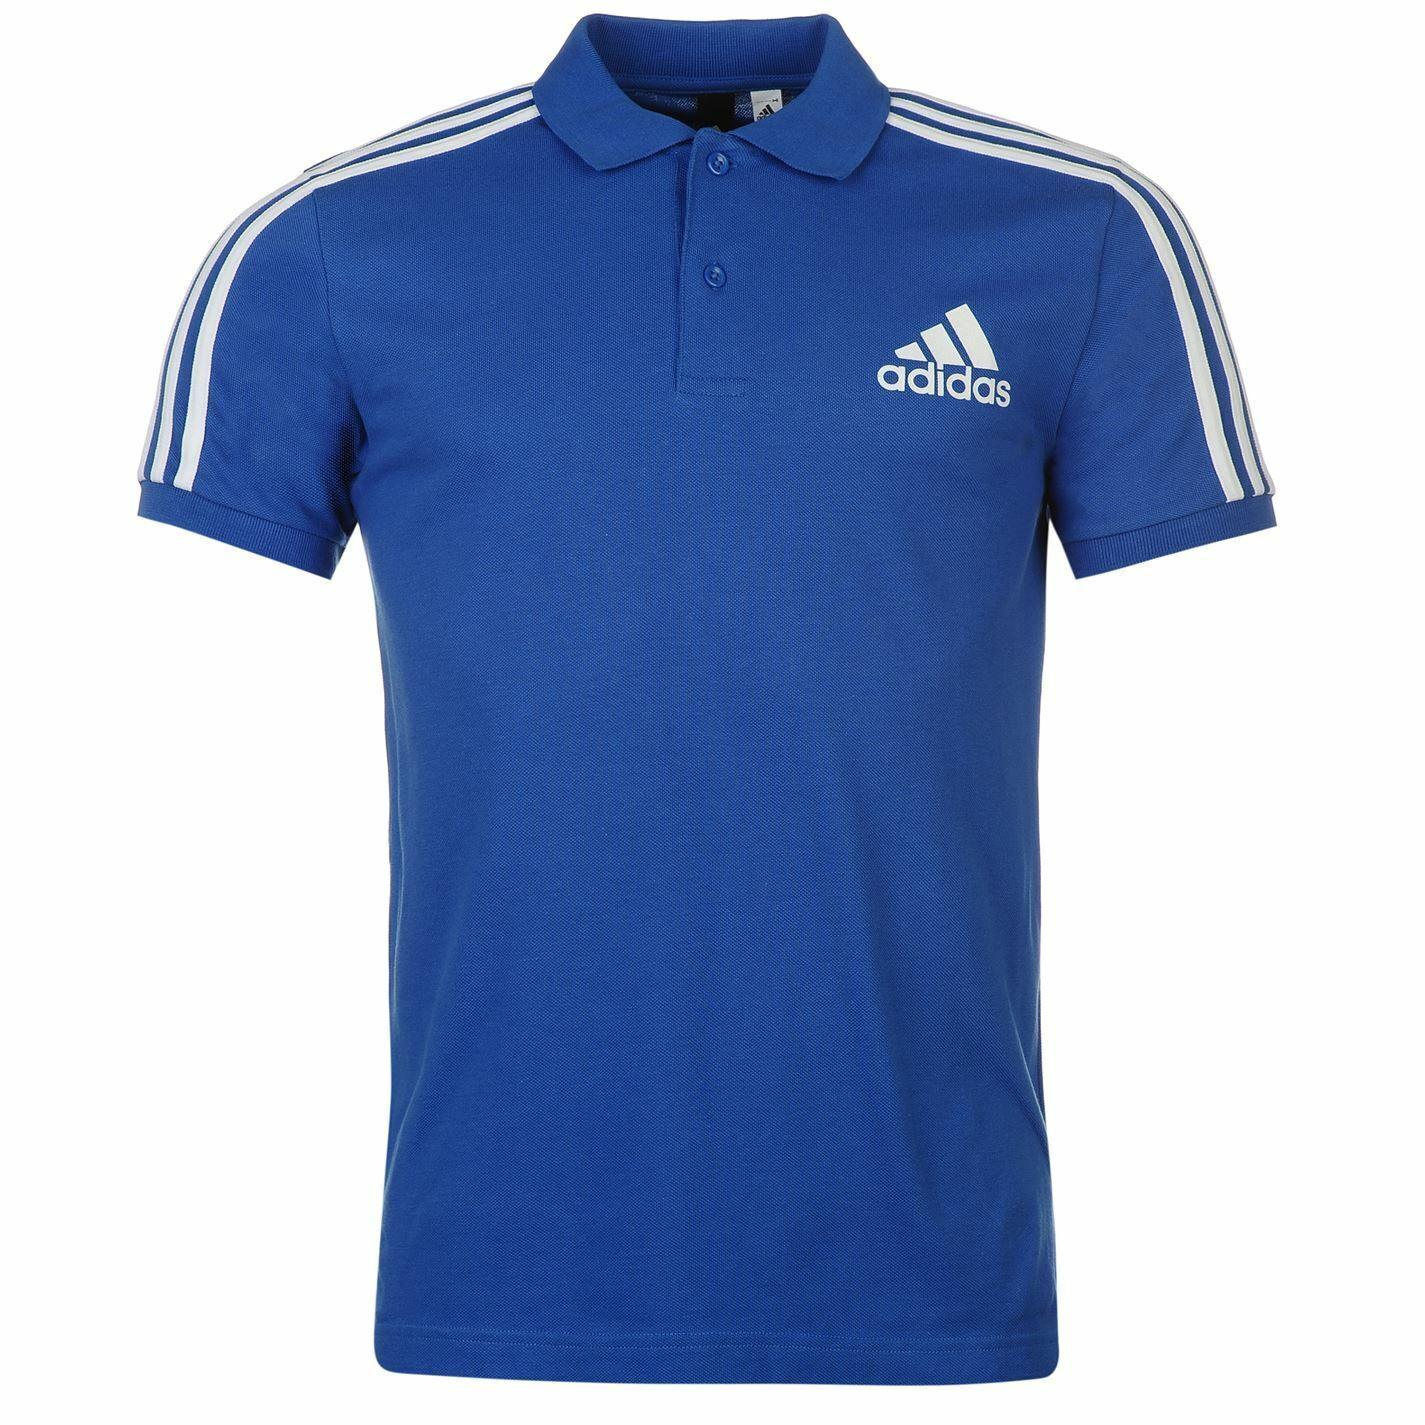 Adidas 3 Strisce Polo con Logo da Uomo Blu Bianco con Colletto T-Shirt Top